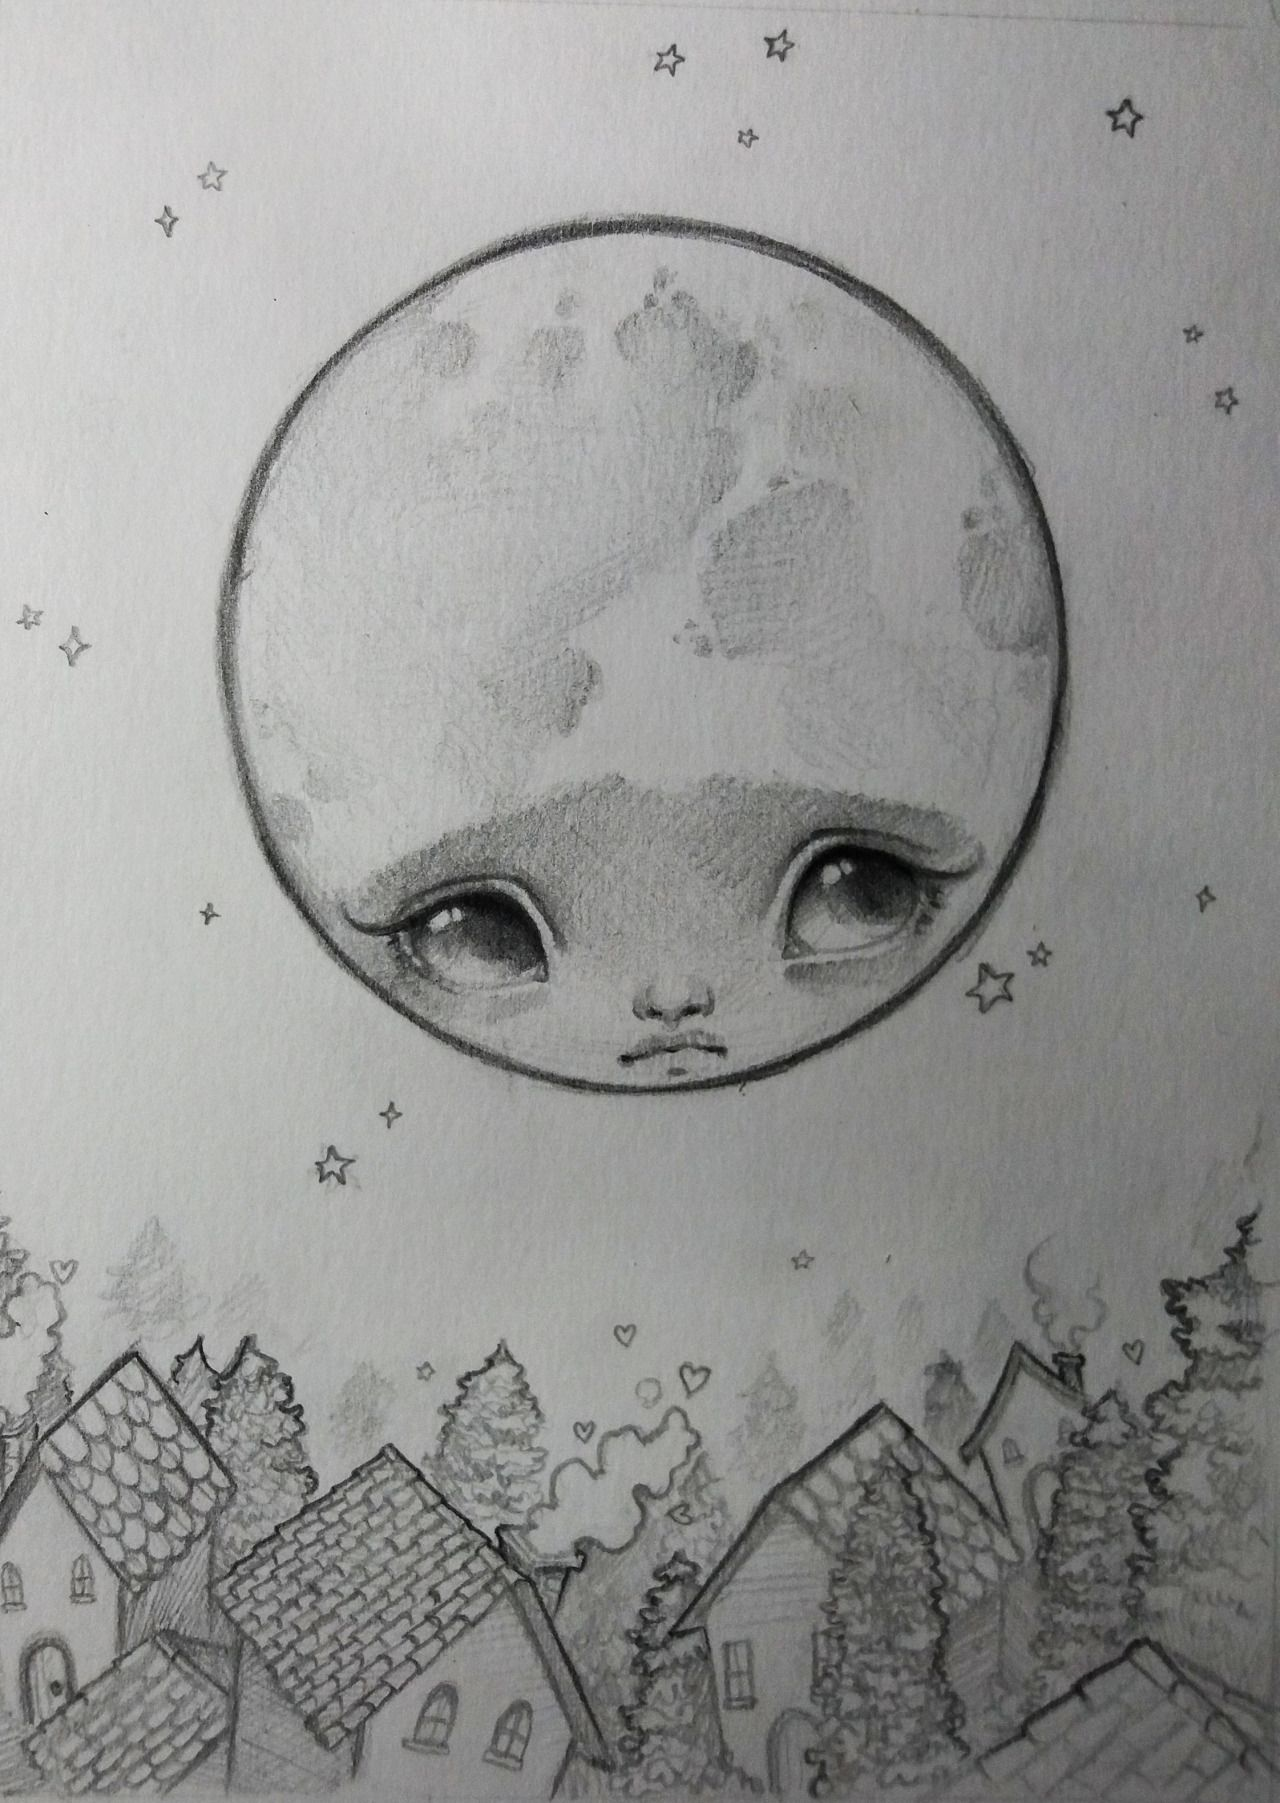 Dibujo De La Luna Llena Arte Love Moon Pencil Love Beautiful Luna Noche Stars Fullmoon Dream Sketch Sketchbook Sketching Art Sketches La Luna